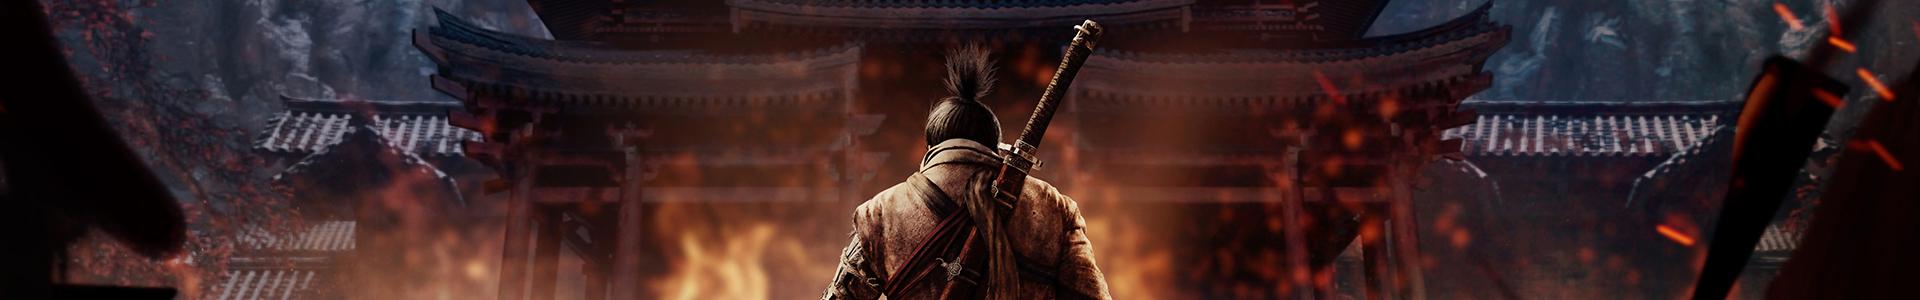 Banner media of Sekiro: Shadows Die Twice video game.